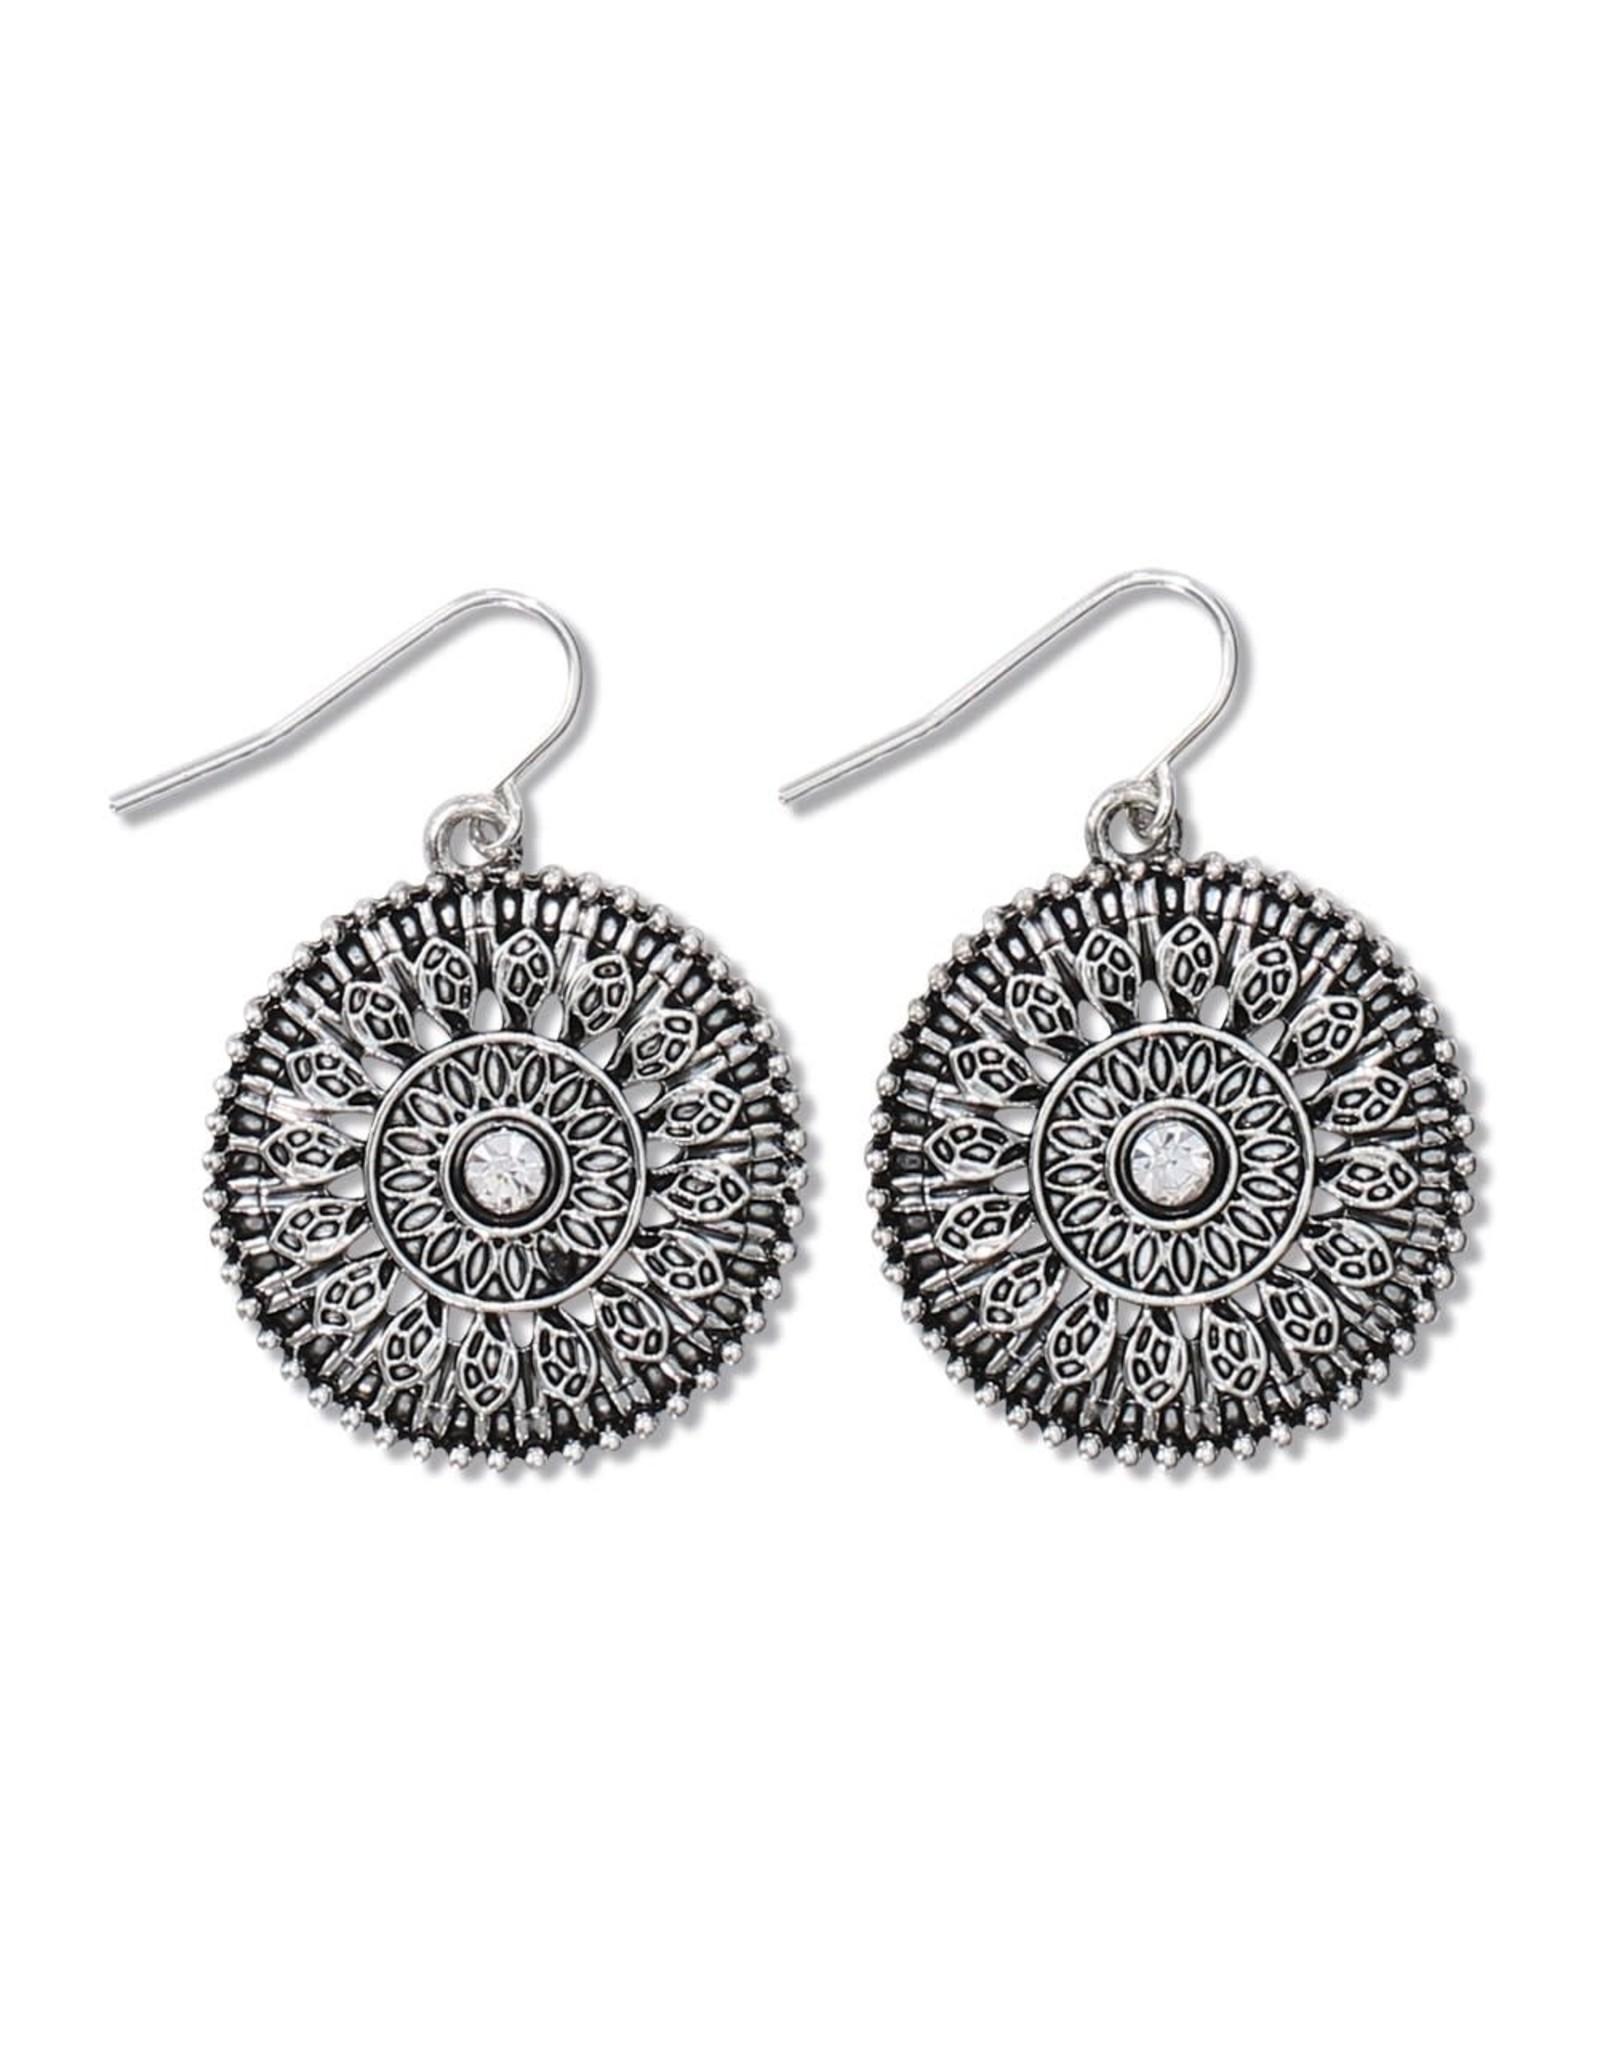 Periwinkle by Barlow Antiqued Silver Crystal Disc Earrings